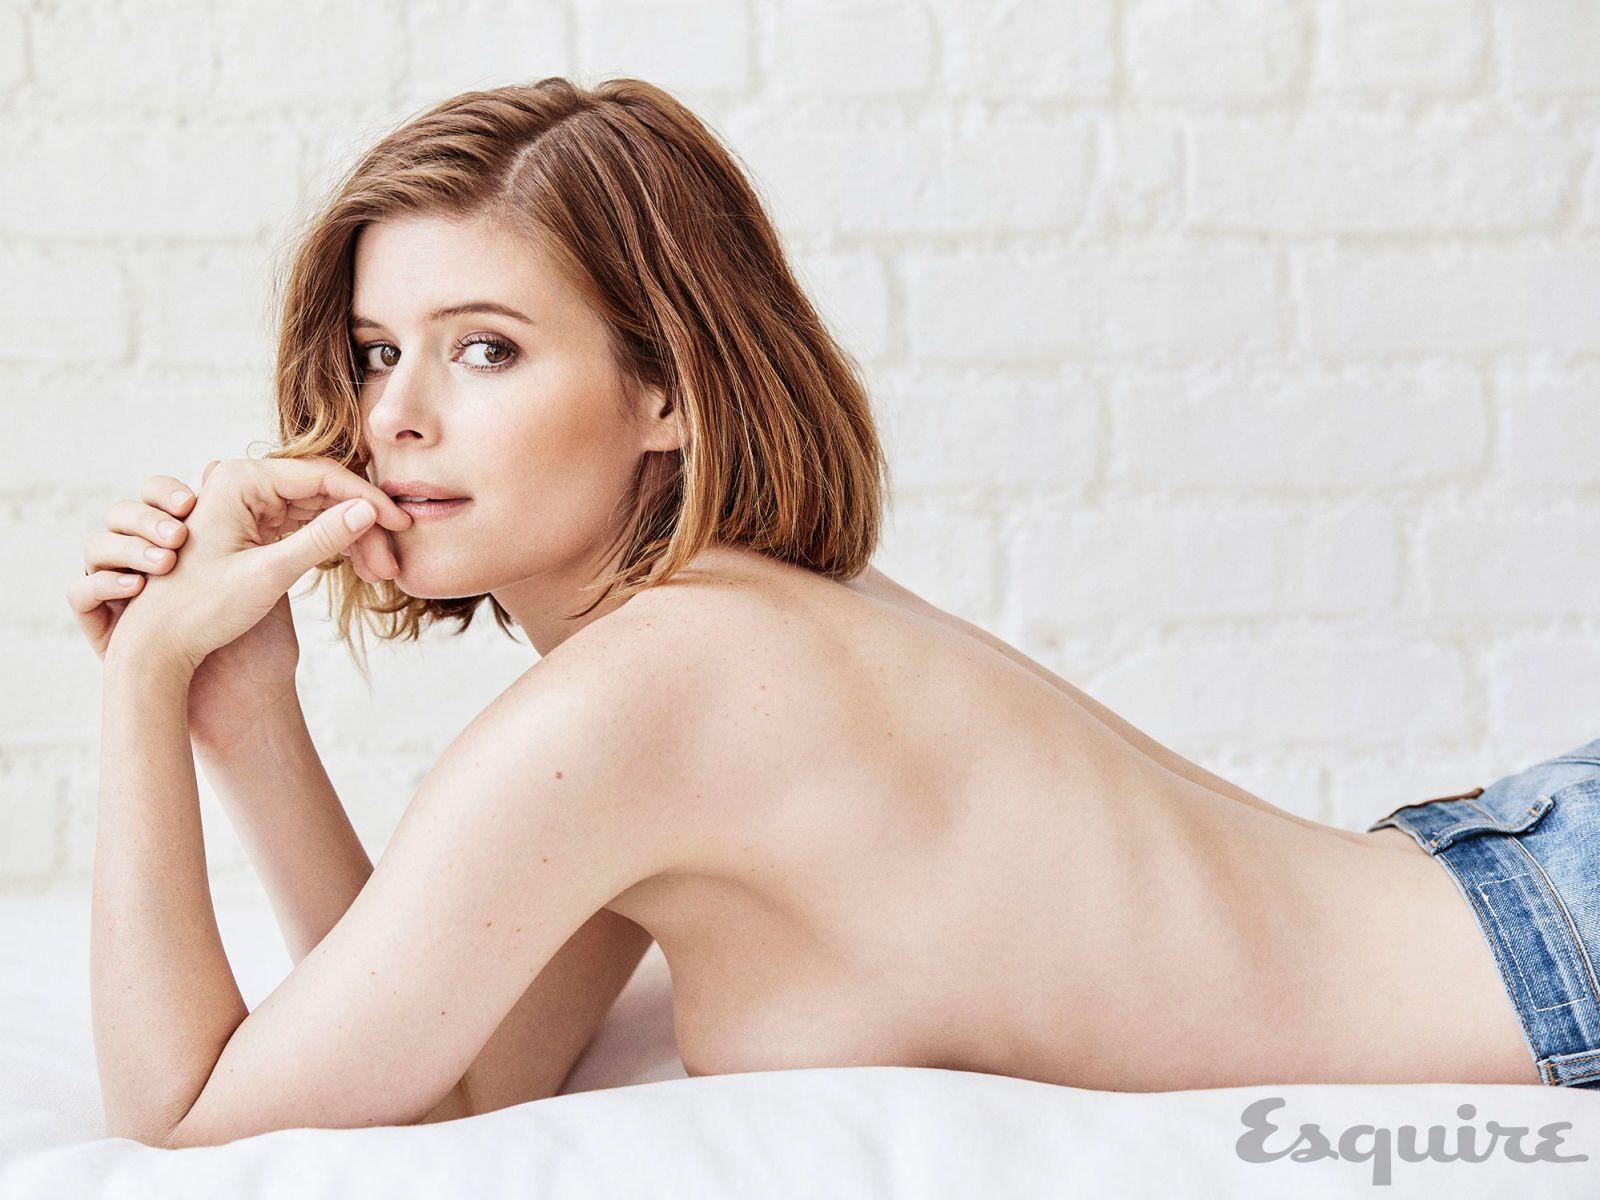 Homemade amateur milf wife nude